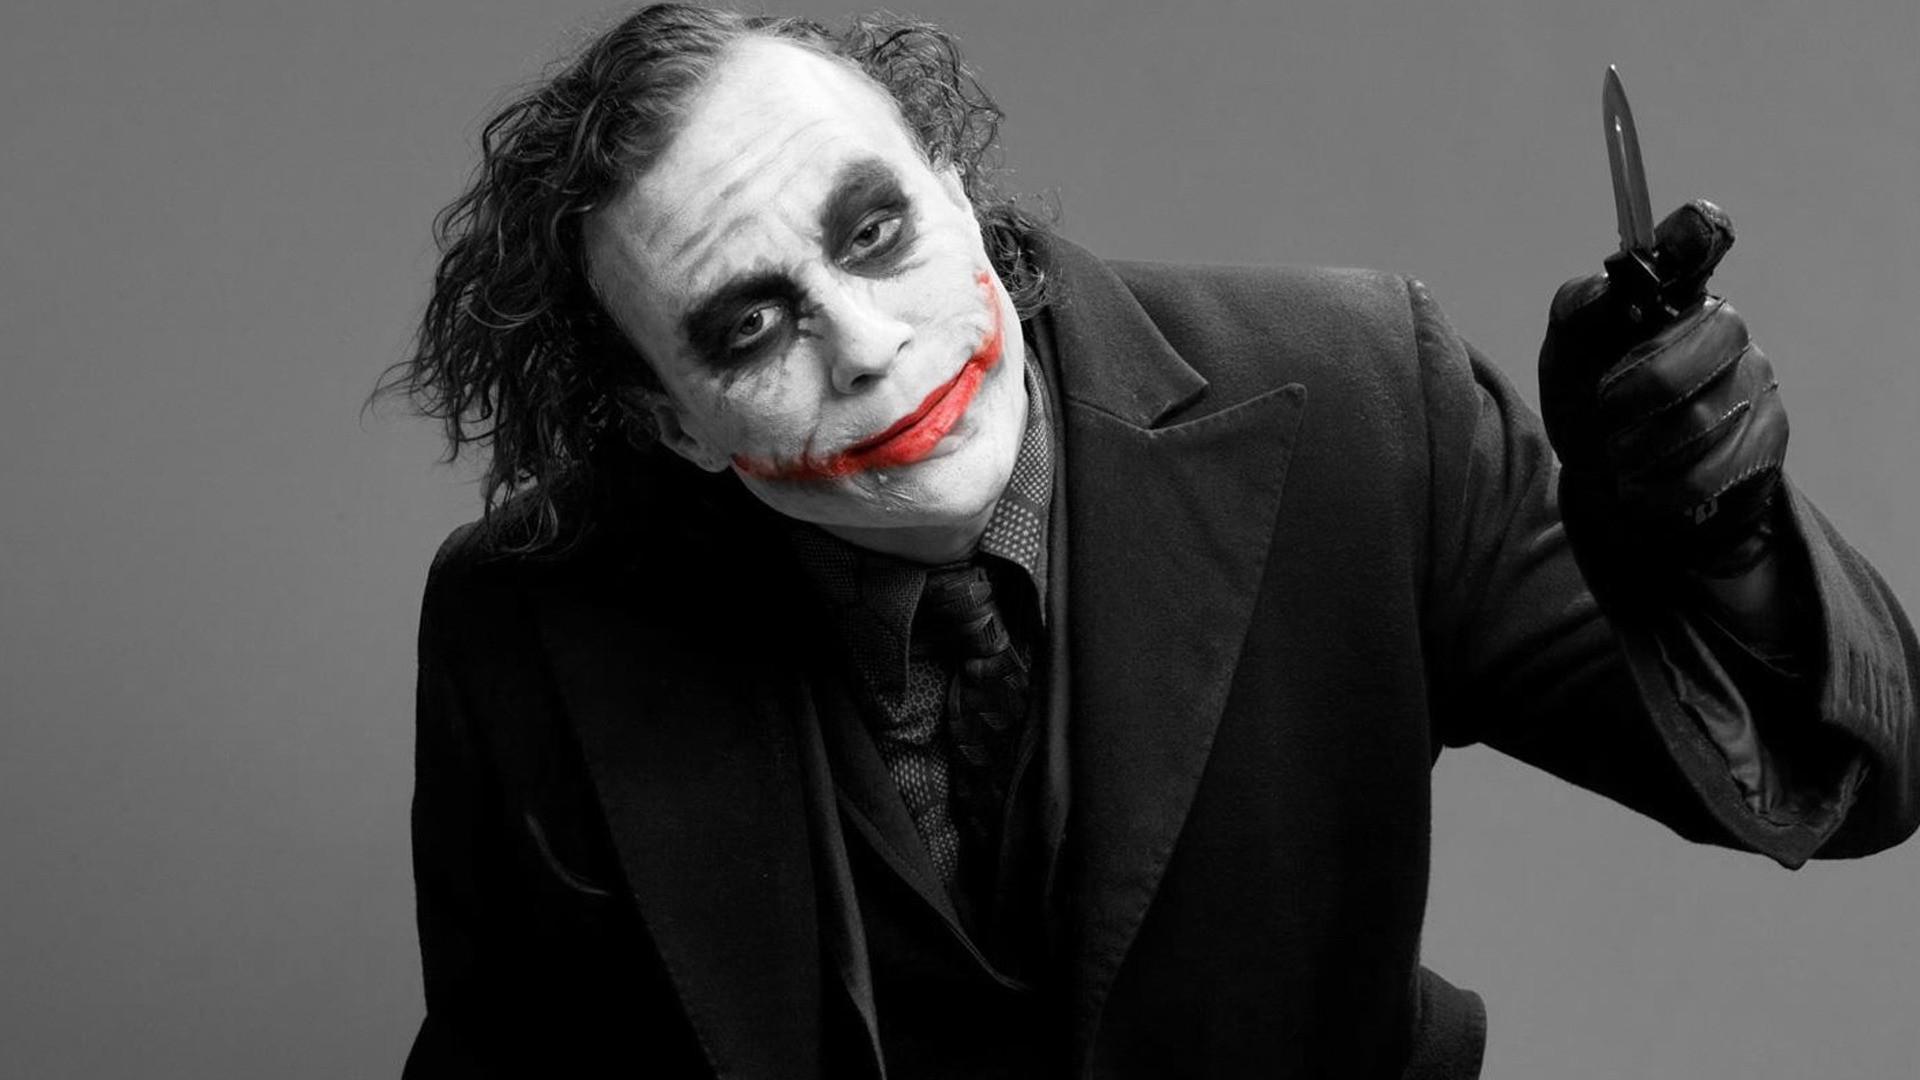 1920x1080 Px Batman Black And Red DC Comics Heath Ledger Joker Photography